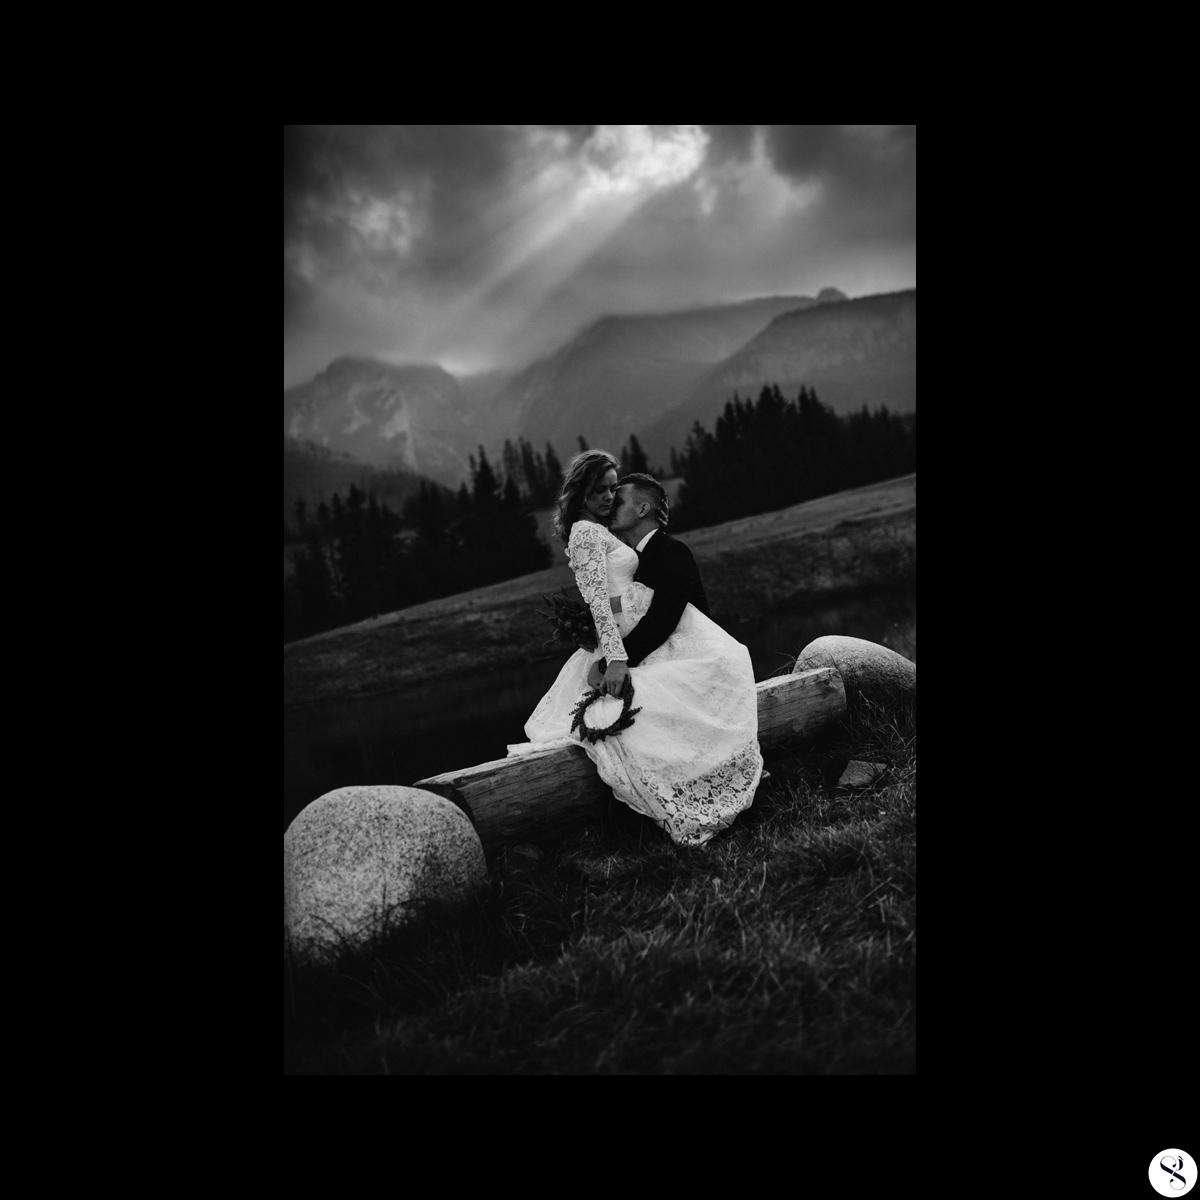 ssg_pati-piter_139-copy